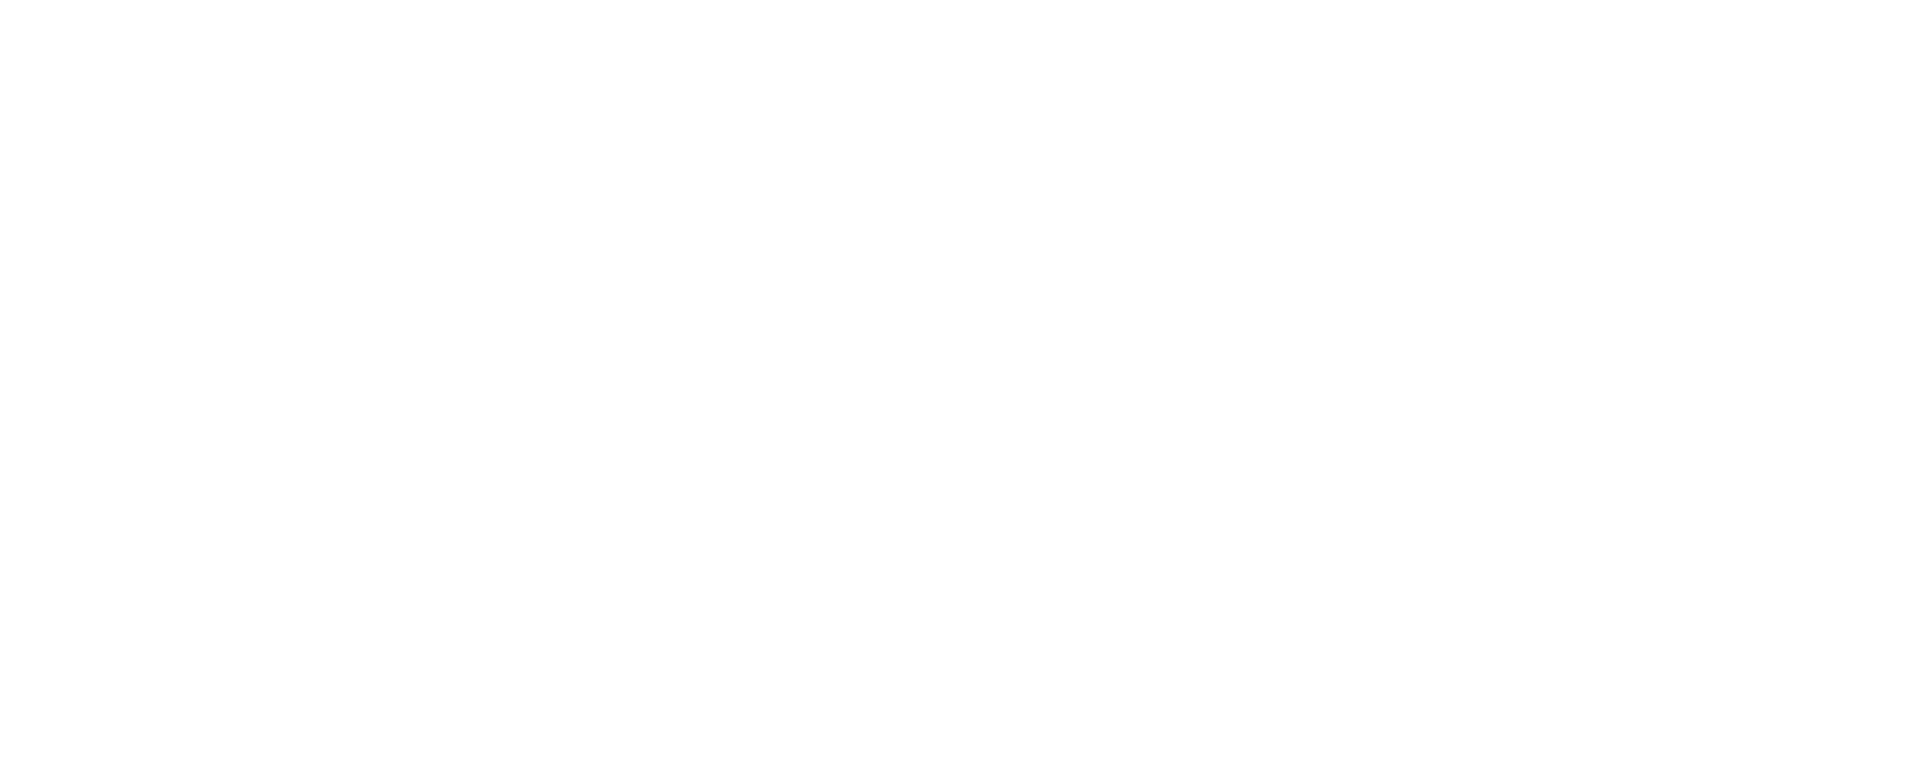 familyid-logo-9bcc3ad434206421a3125019c78e2d3bfa3ec28ee07b8ed19e16fb9214c3ddf2.png